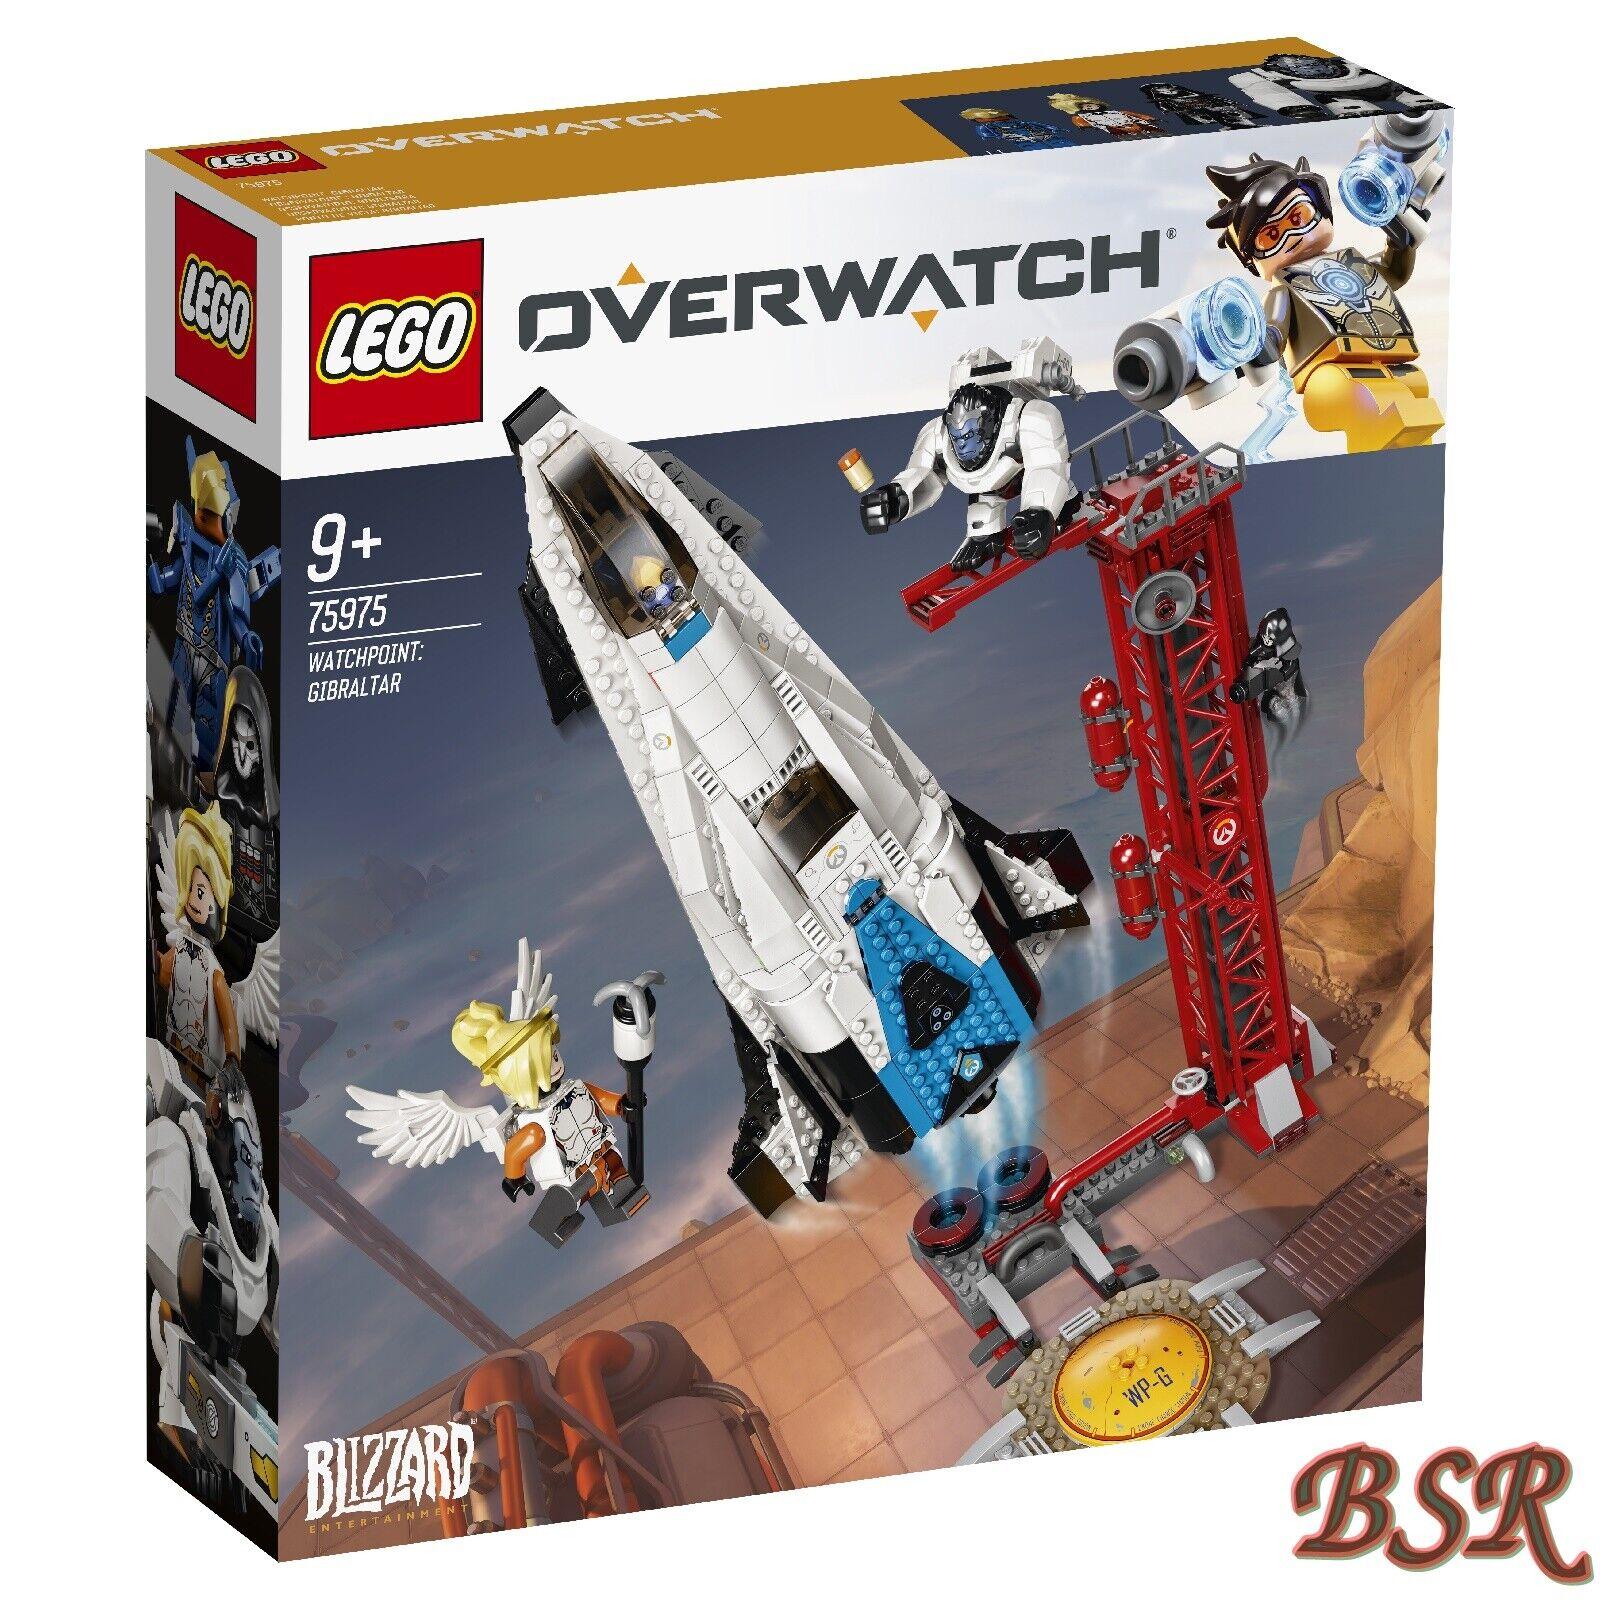 LEGO ® Overwatch  75975 watchpoint  Gibraltar & 0. - expédition & NOUVEAU & NEUF dans sa boîte